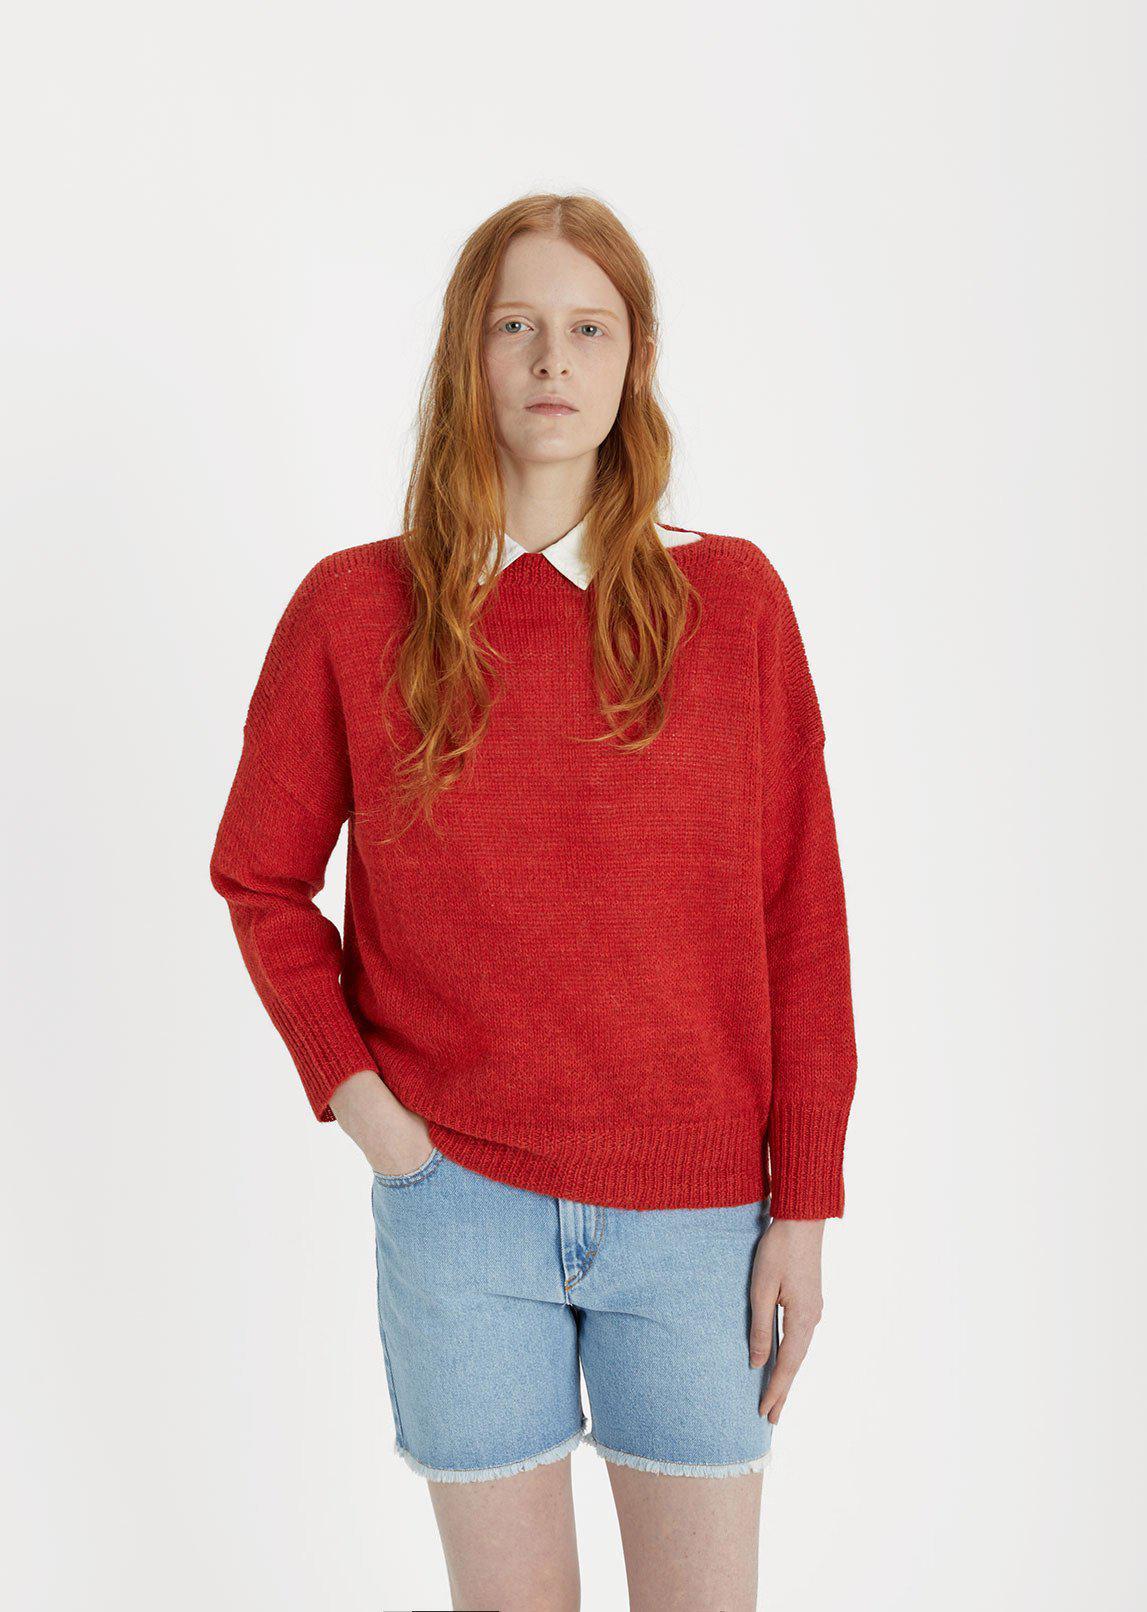 lyst toile isabel marant grace alpaca knit in red. Black Bedroom Furniture Sets. Home Design Ideas